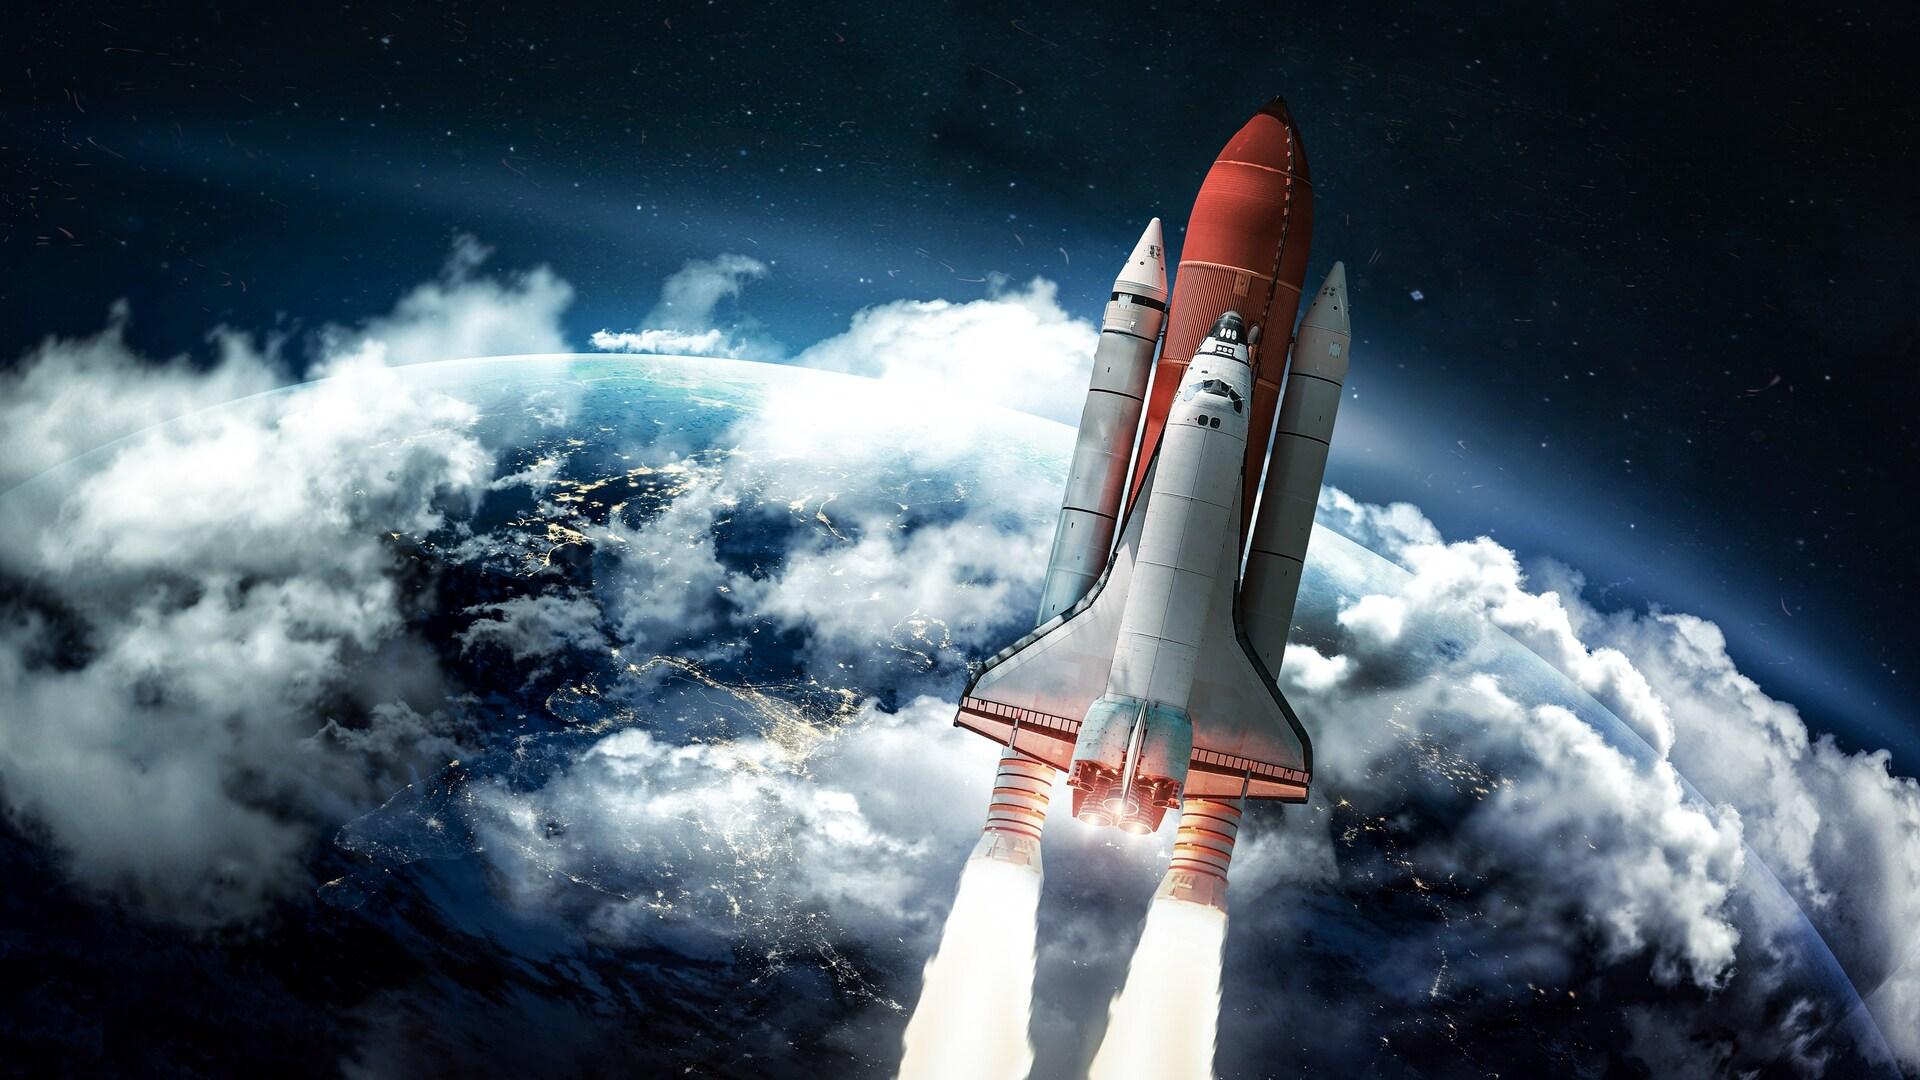 1920x1080 Rocket Heading Towards Space Laptop Full Hd 1080p